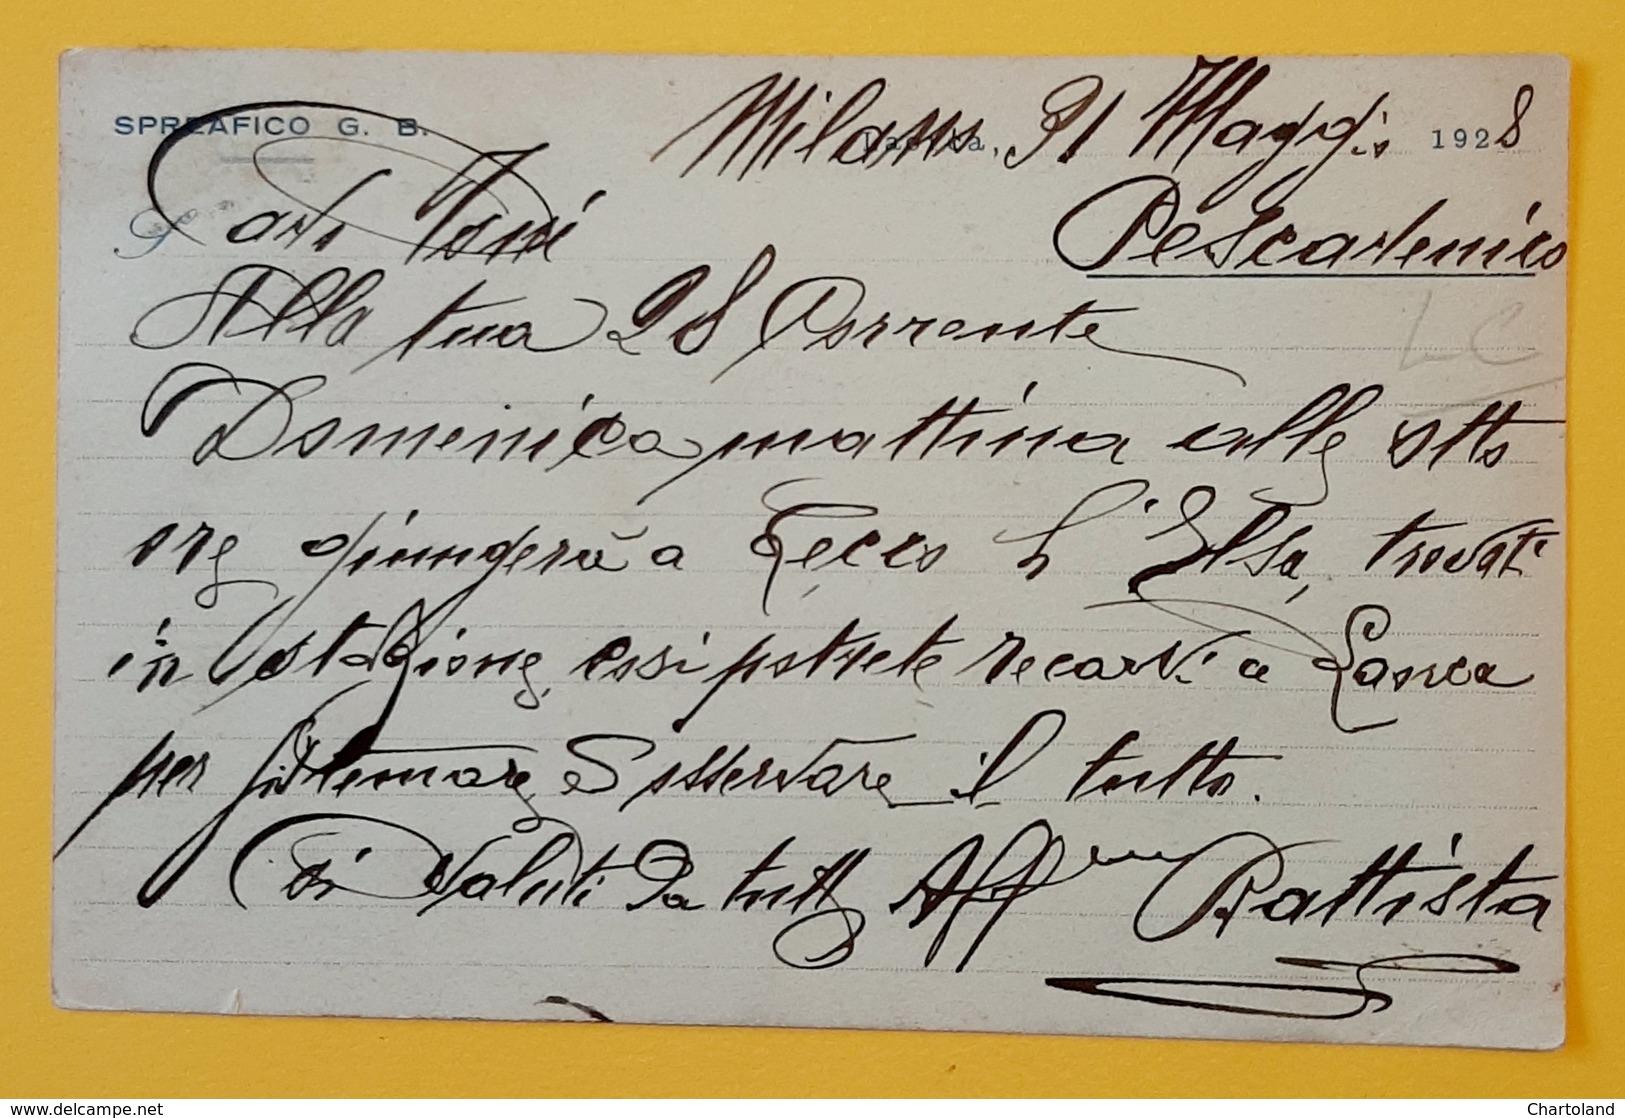 Cartolina Fabbrica Di Ferramenta - Spreafico G. B. - 1928 - Pubblicitari